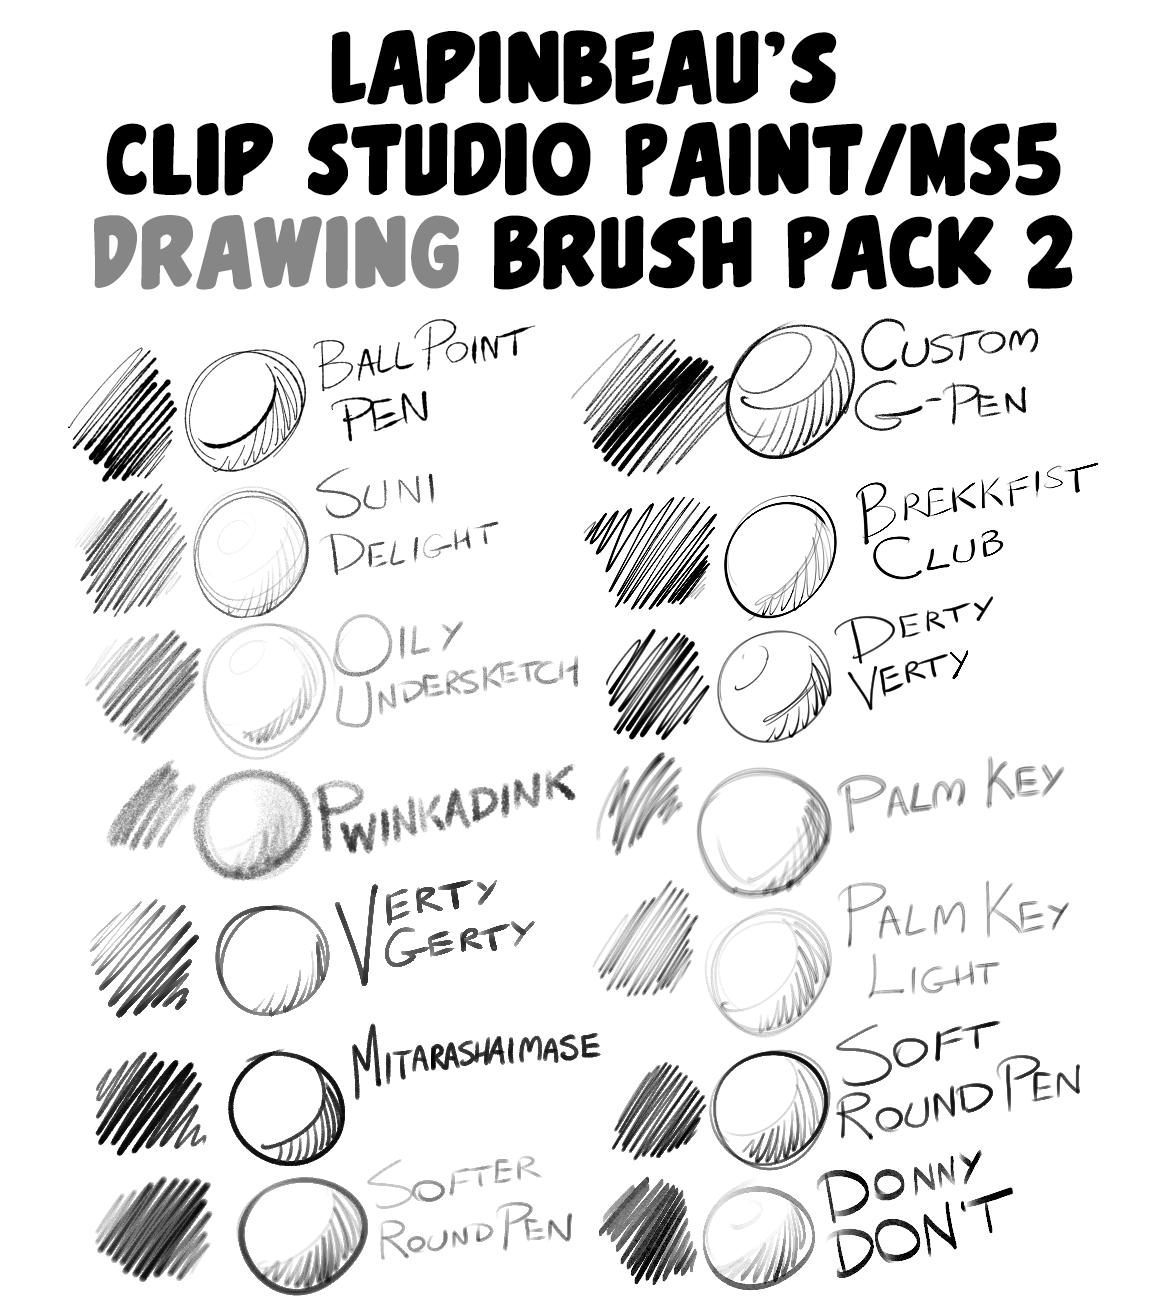 LapinBeau Clip Studio Paint DRAWING BRUSH PACK 2 by lapinbeau.